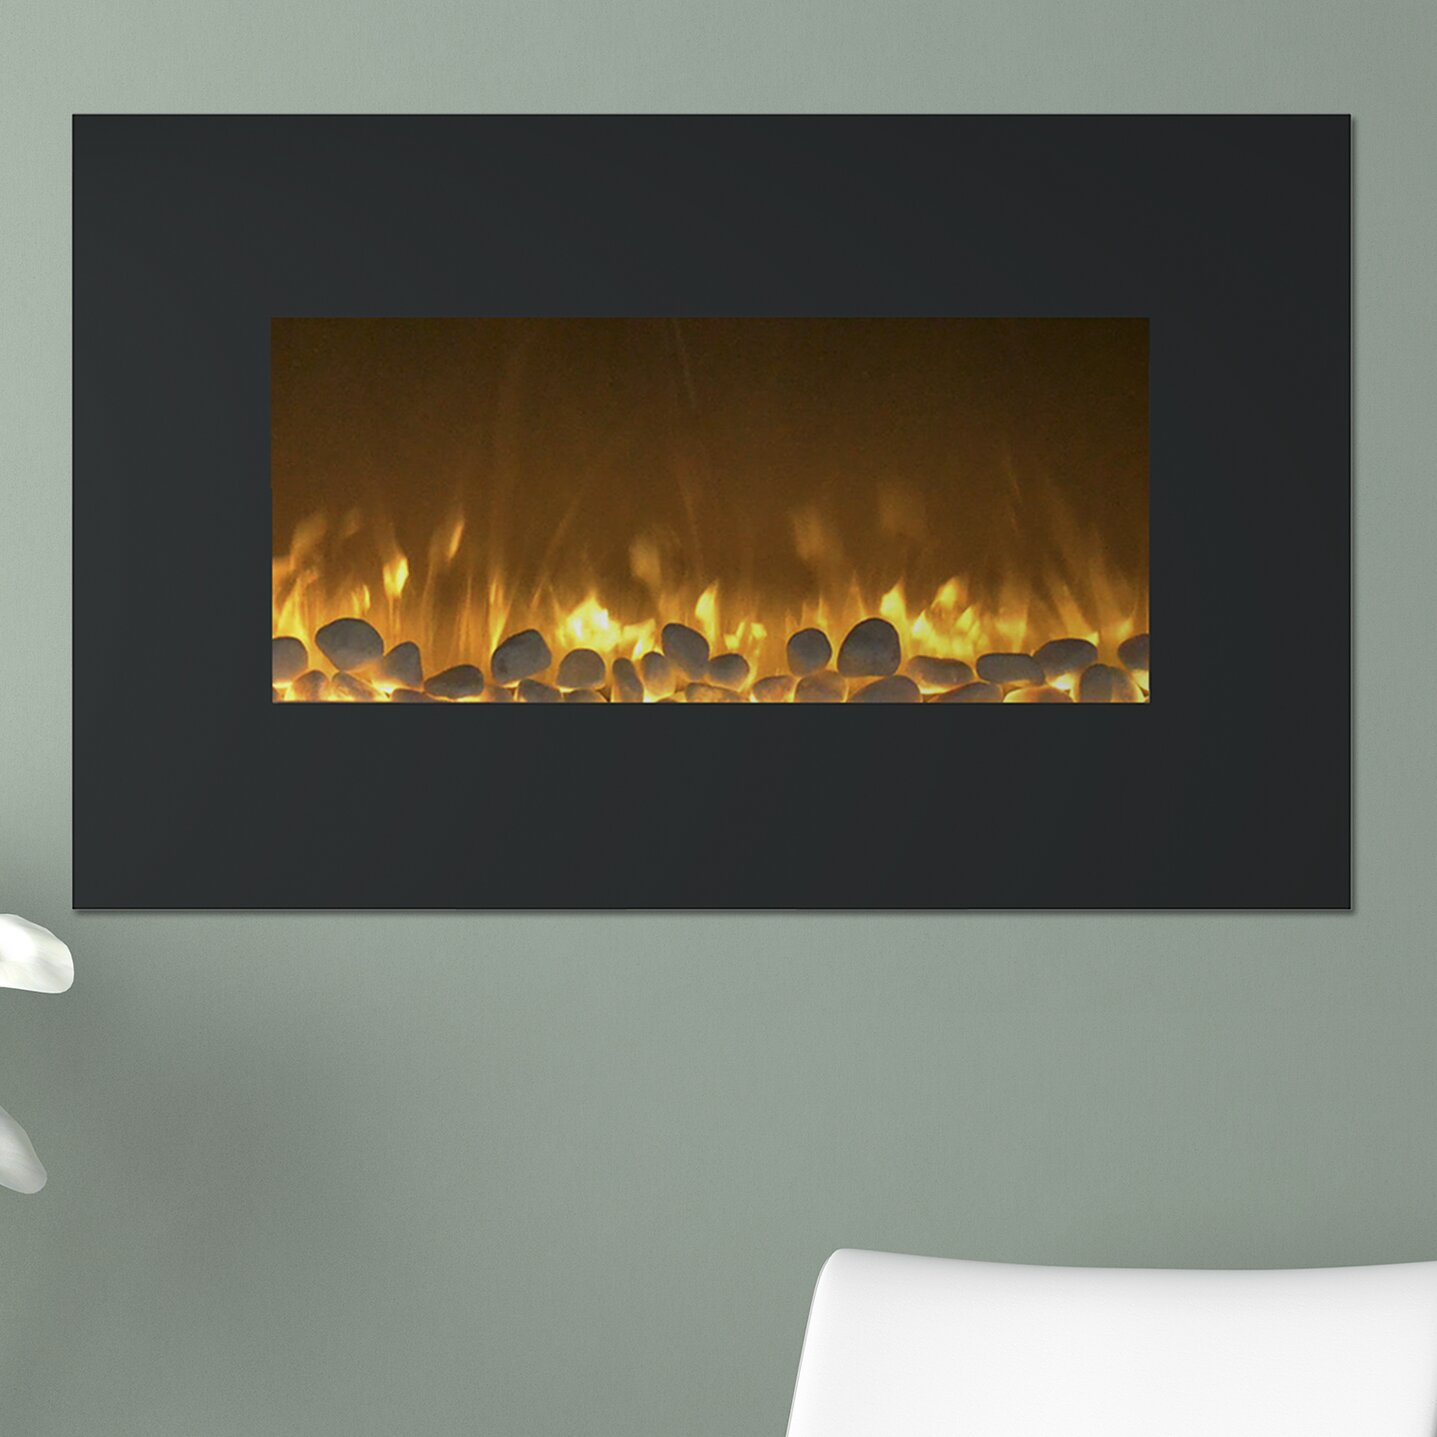 Northwest Flat Wall Mount Electric Fireplace Reviews Wayfair